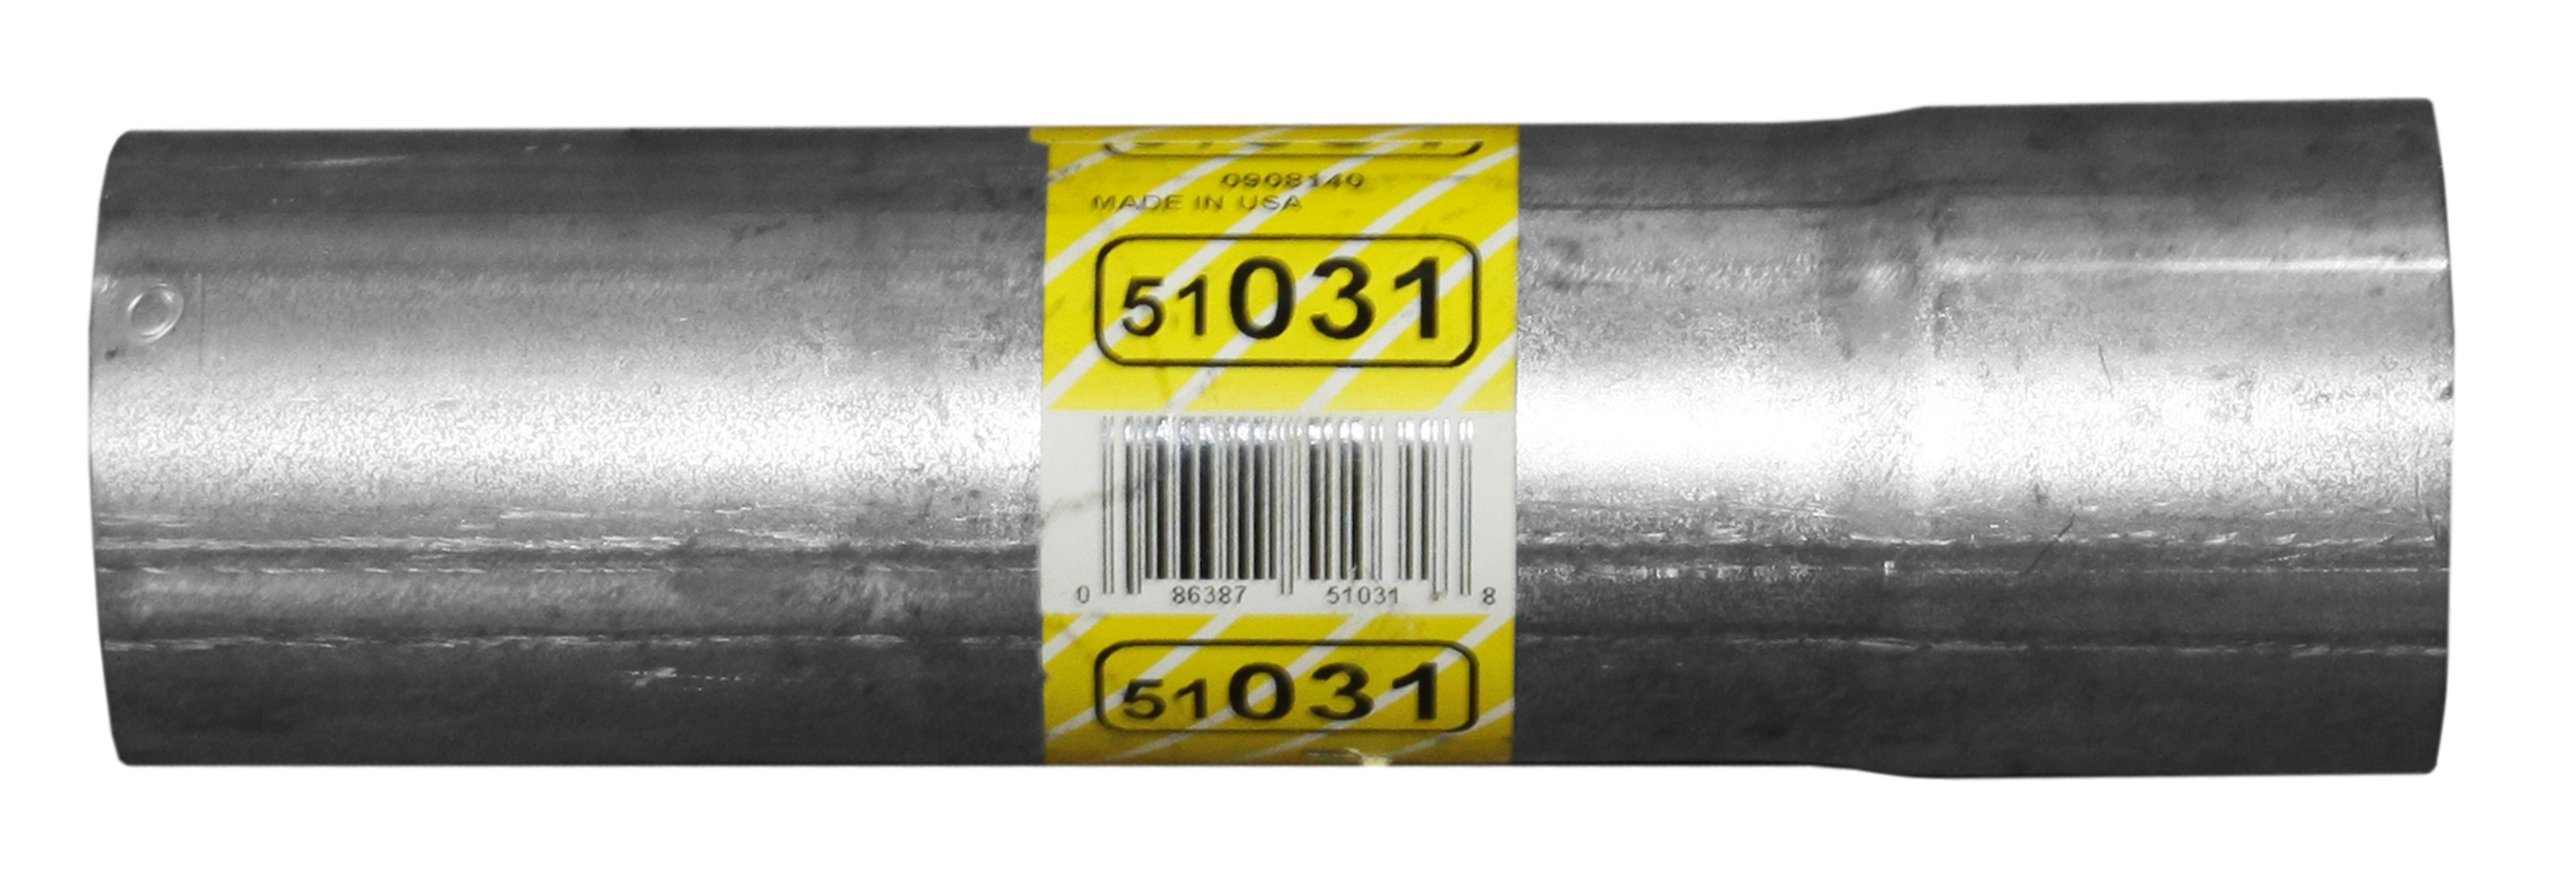 Walker 43477 Extension Pipe